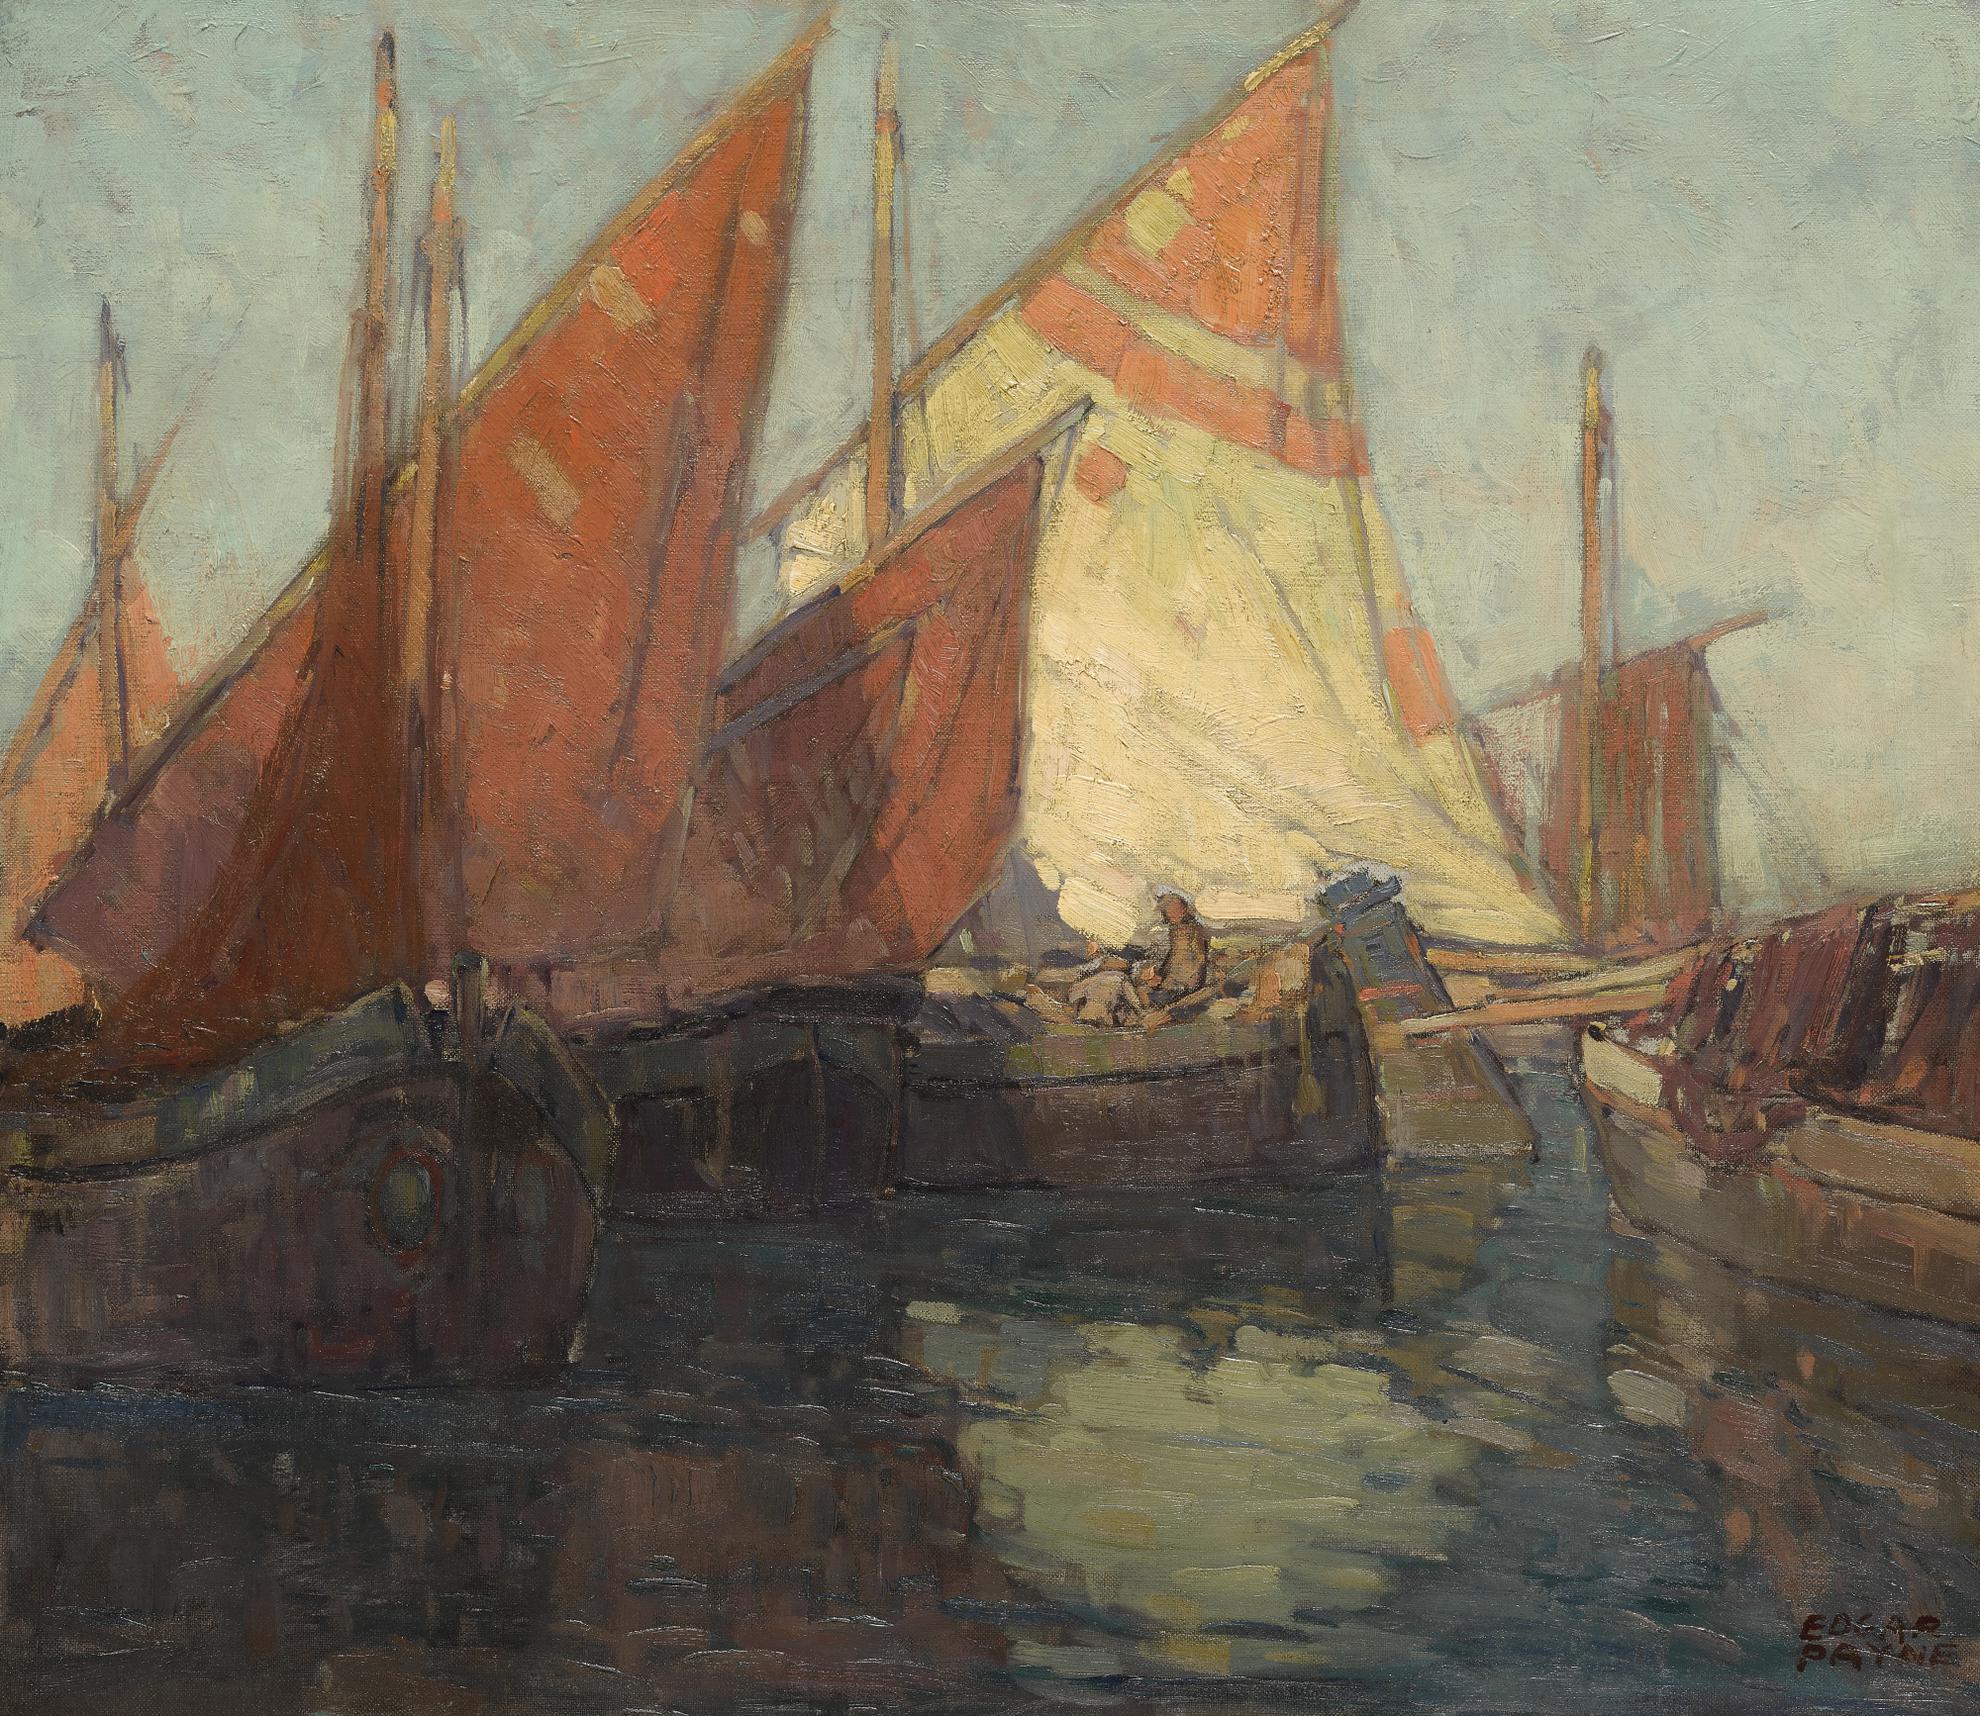 Edgar Alwin Payne - Adriatic Fishing Boats-